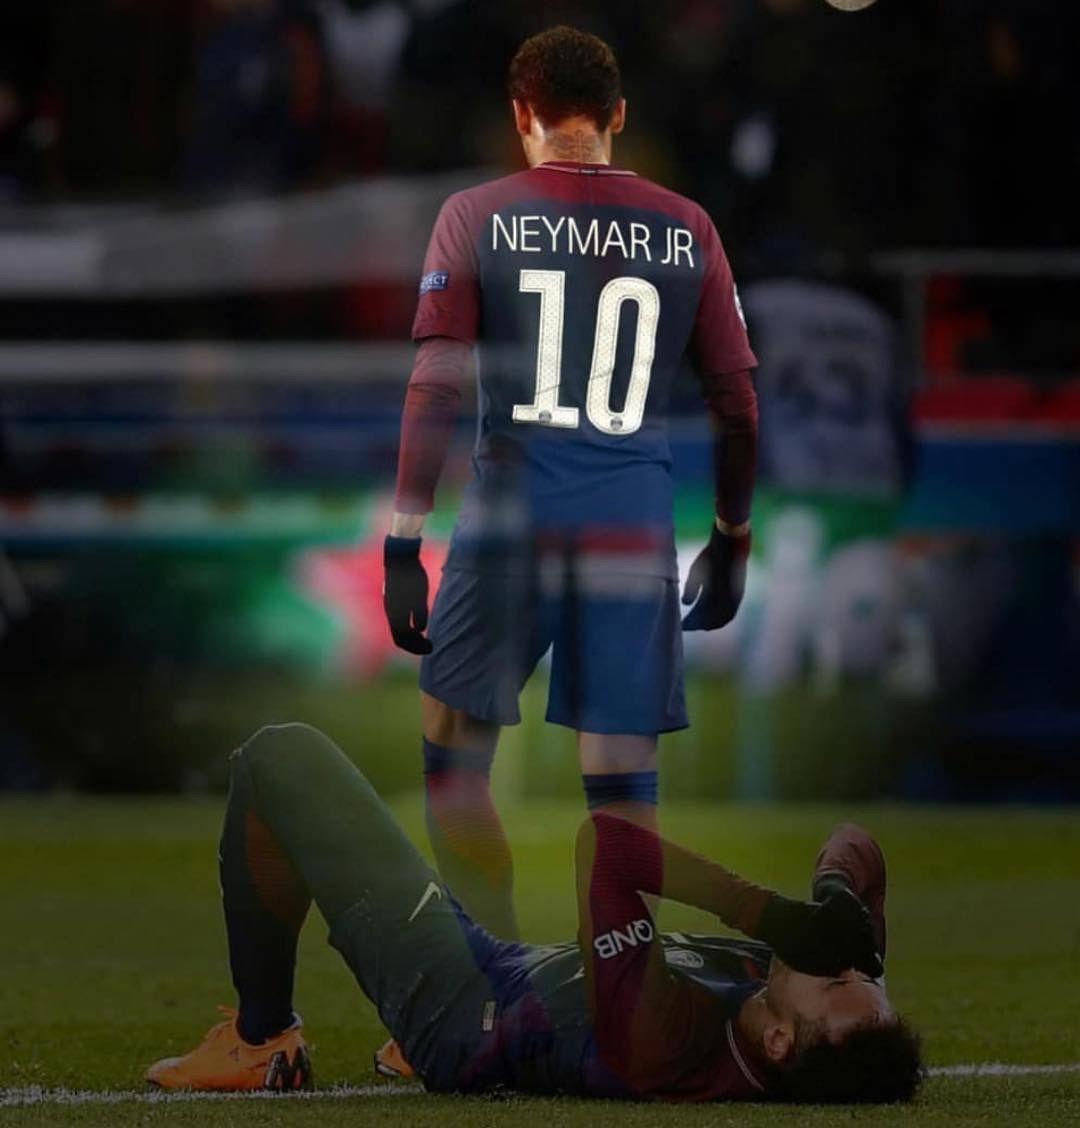 Pin By Kayk Alves On Neymar Jr Neymar Neymar Jr Neymar Pic